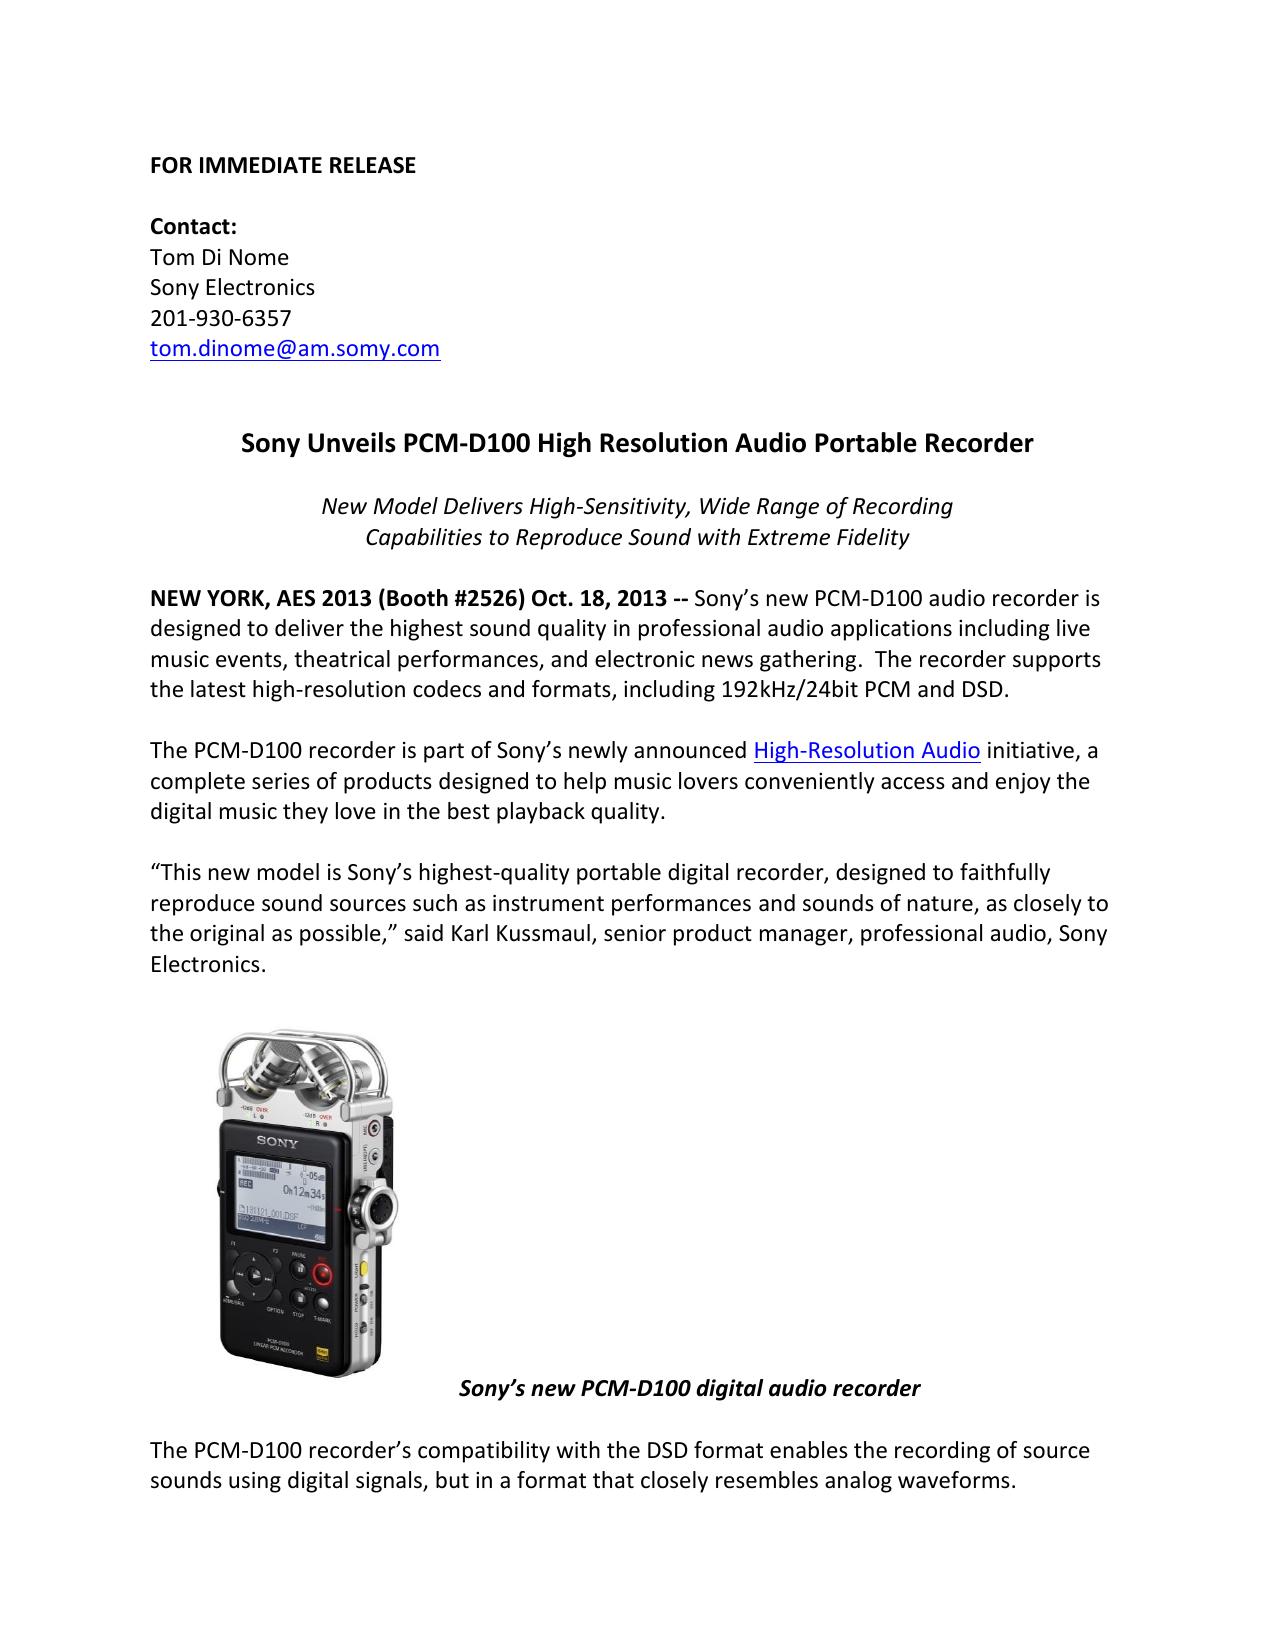 Sony Unveils PCM-D100 High Resolution Audio Portable